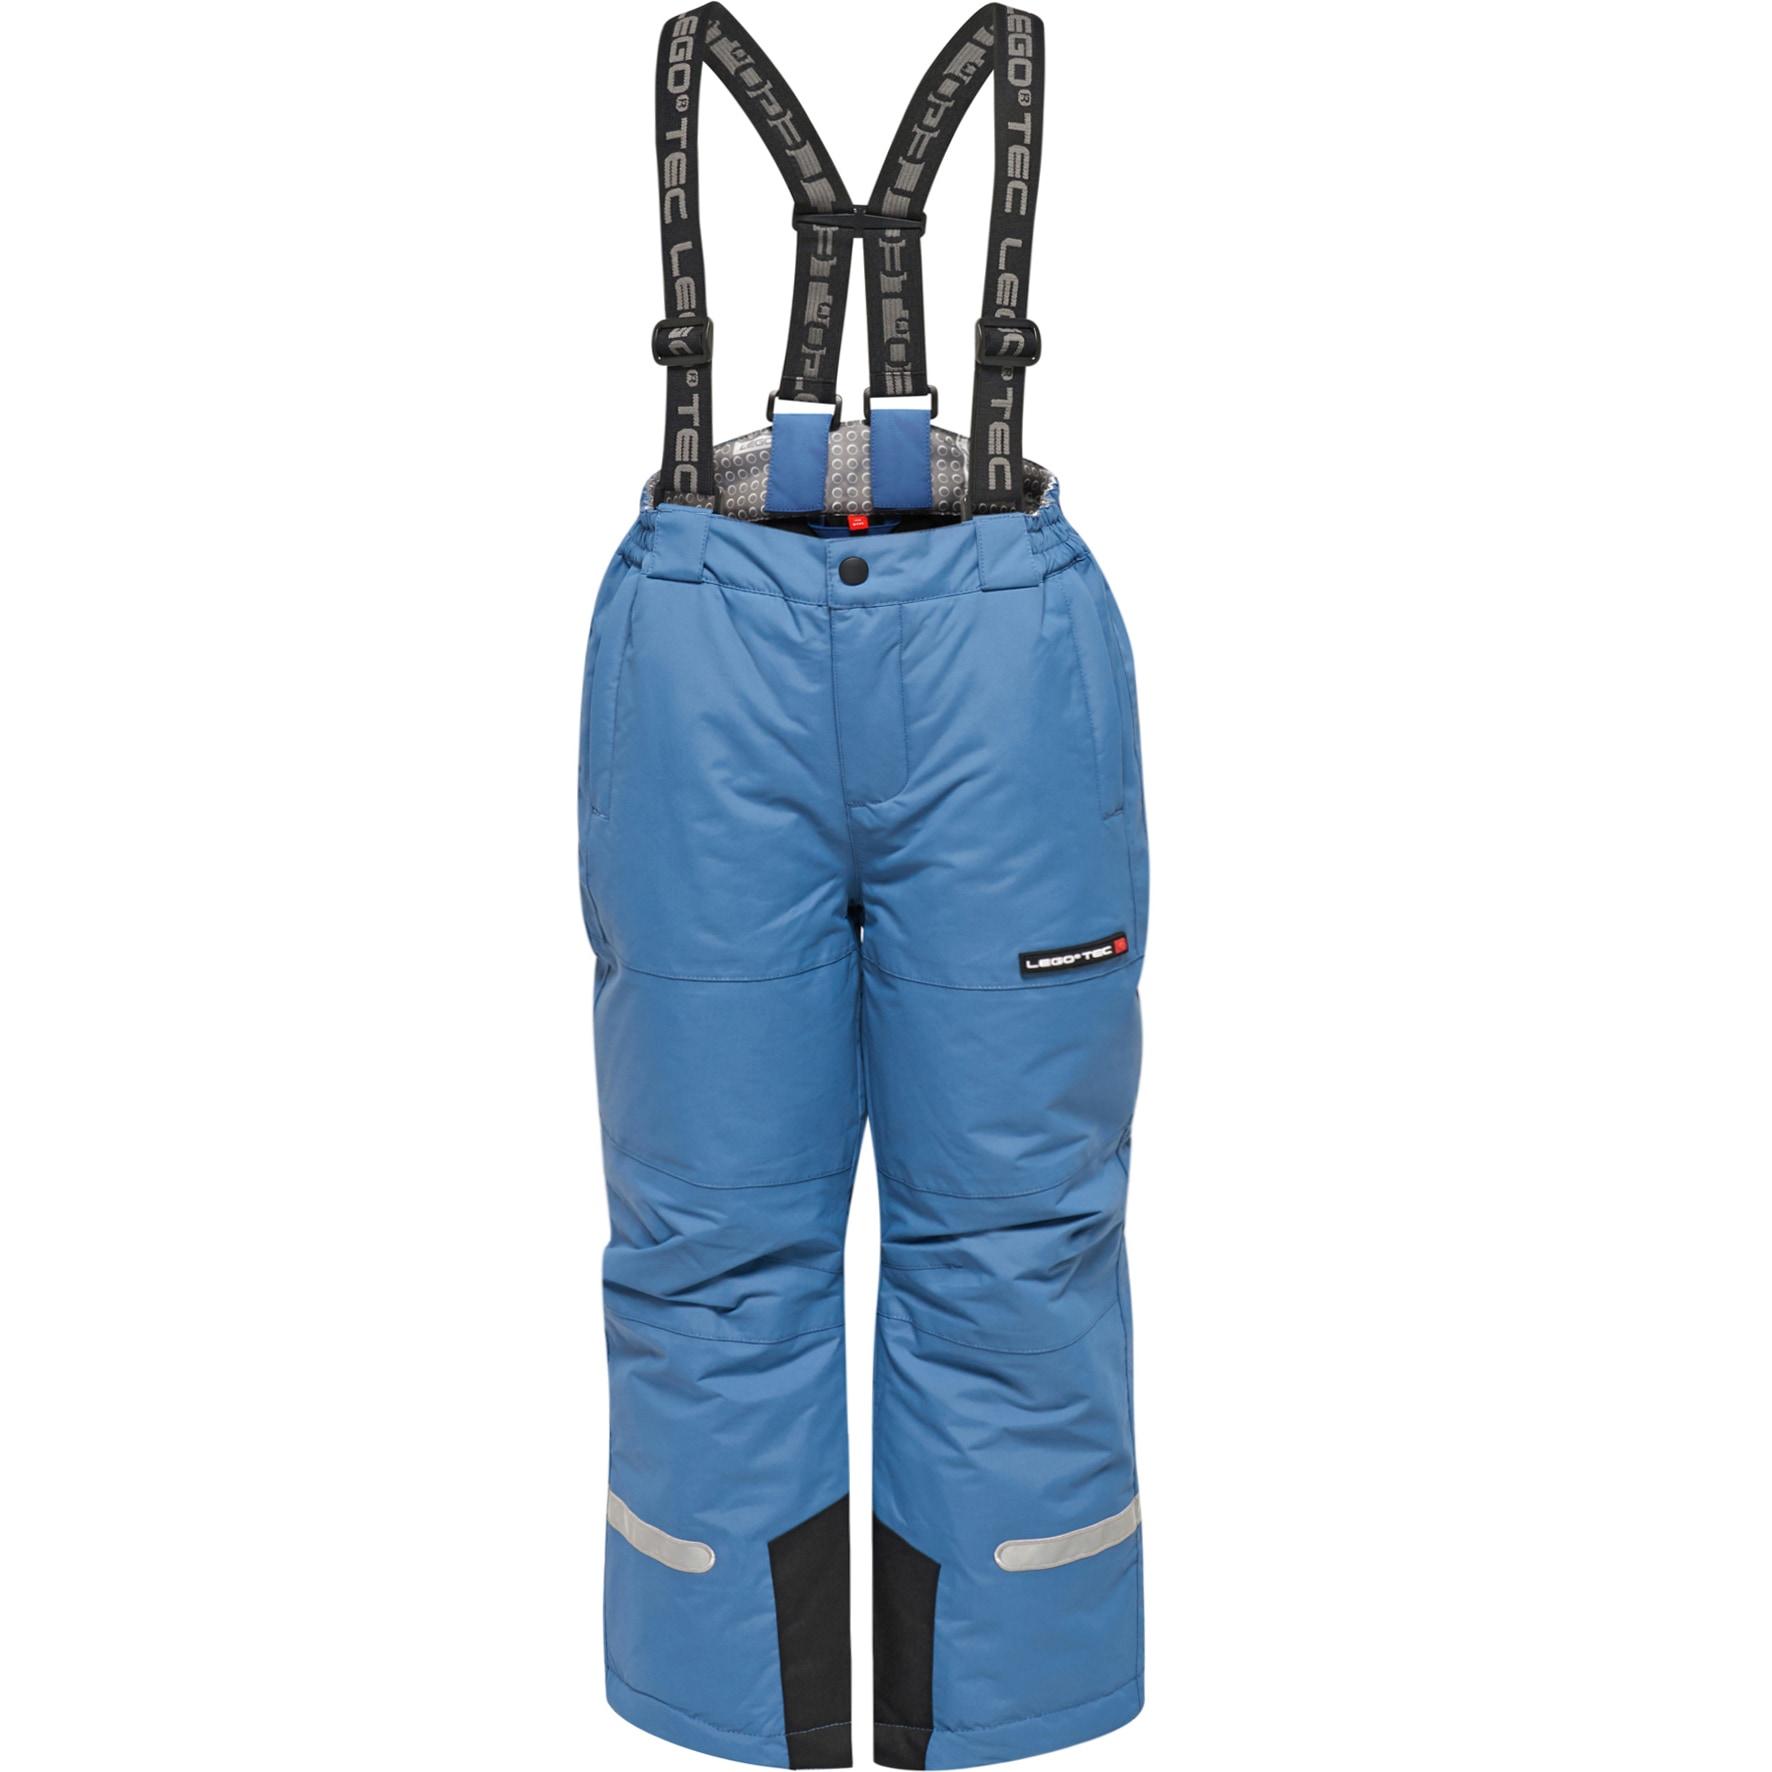 LEGO Wear Skihose PILOU 770 blau Jungen Ski-Bekleidung Ski Sportarten